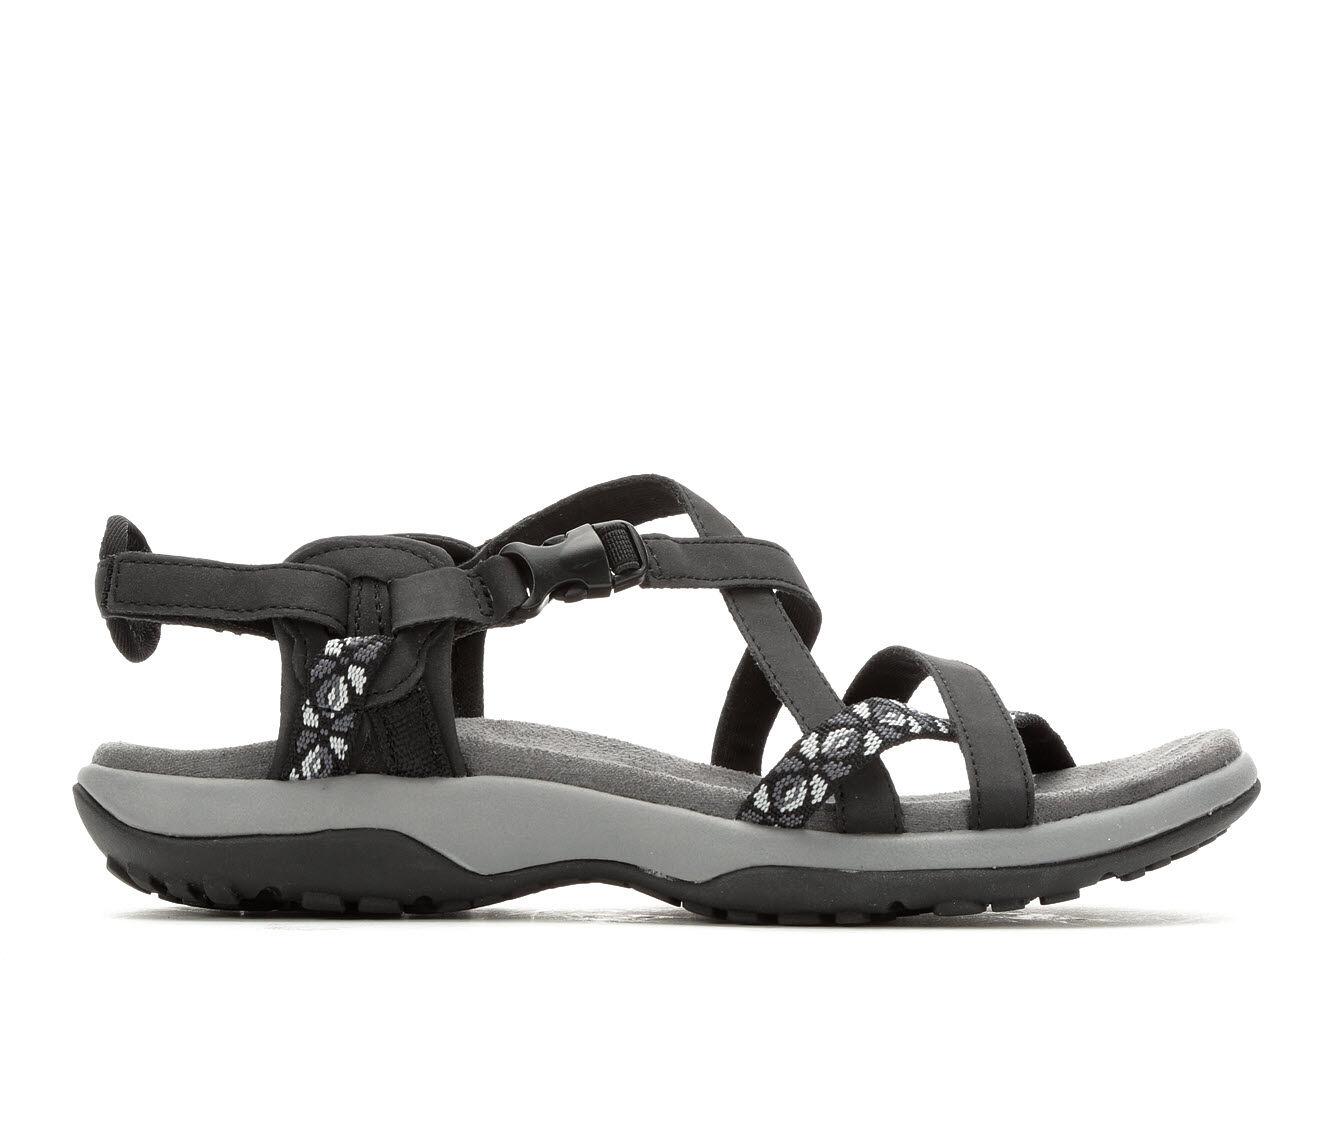 Women's Skechers Reggae Slim Vacay Hiking Sandals Black